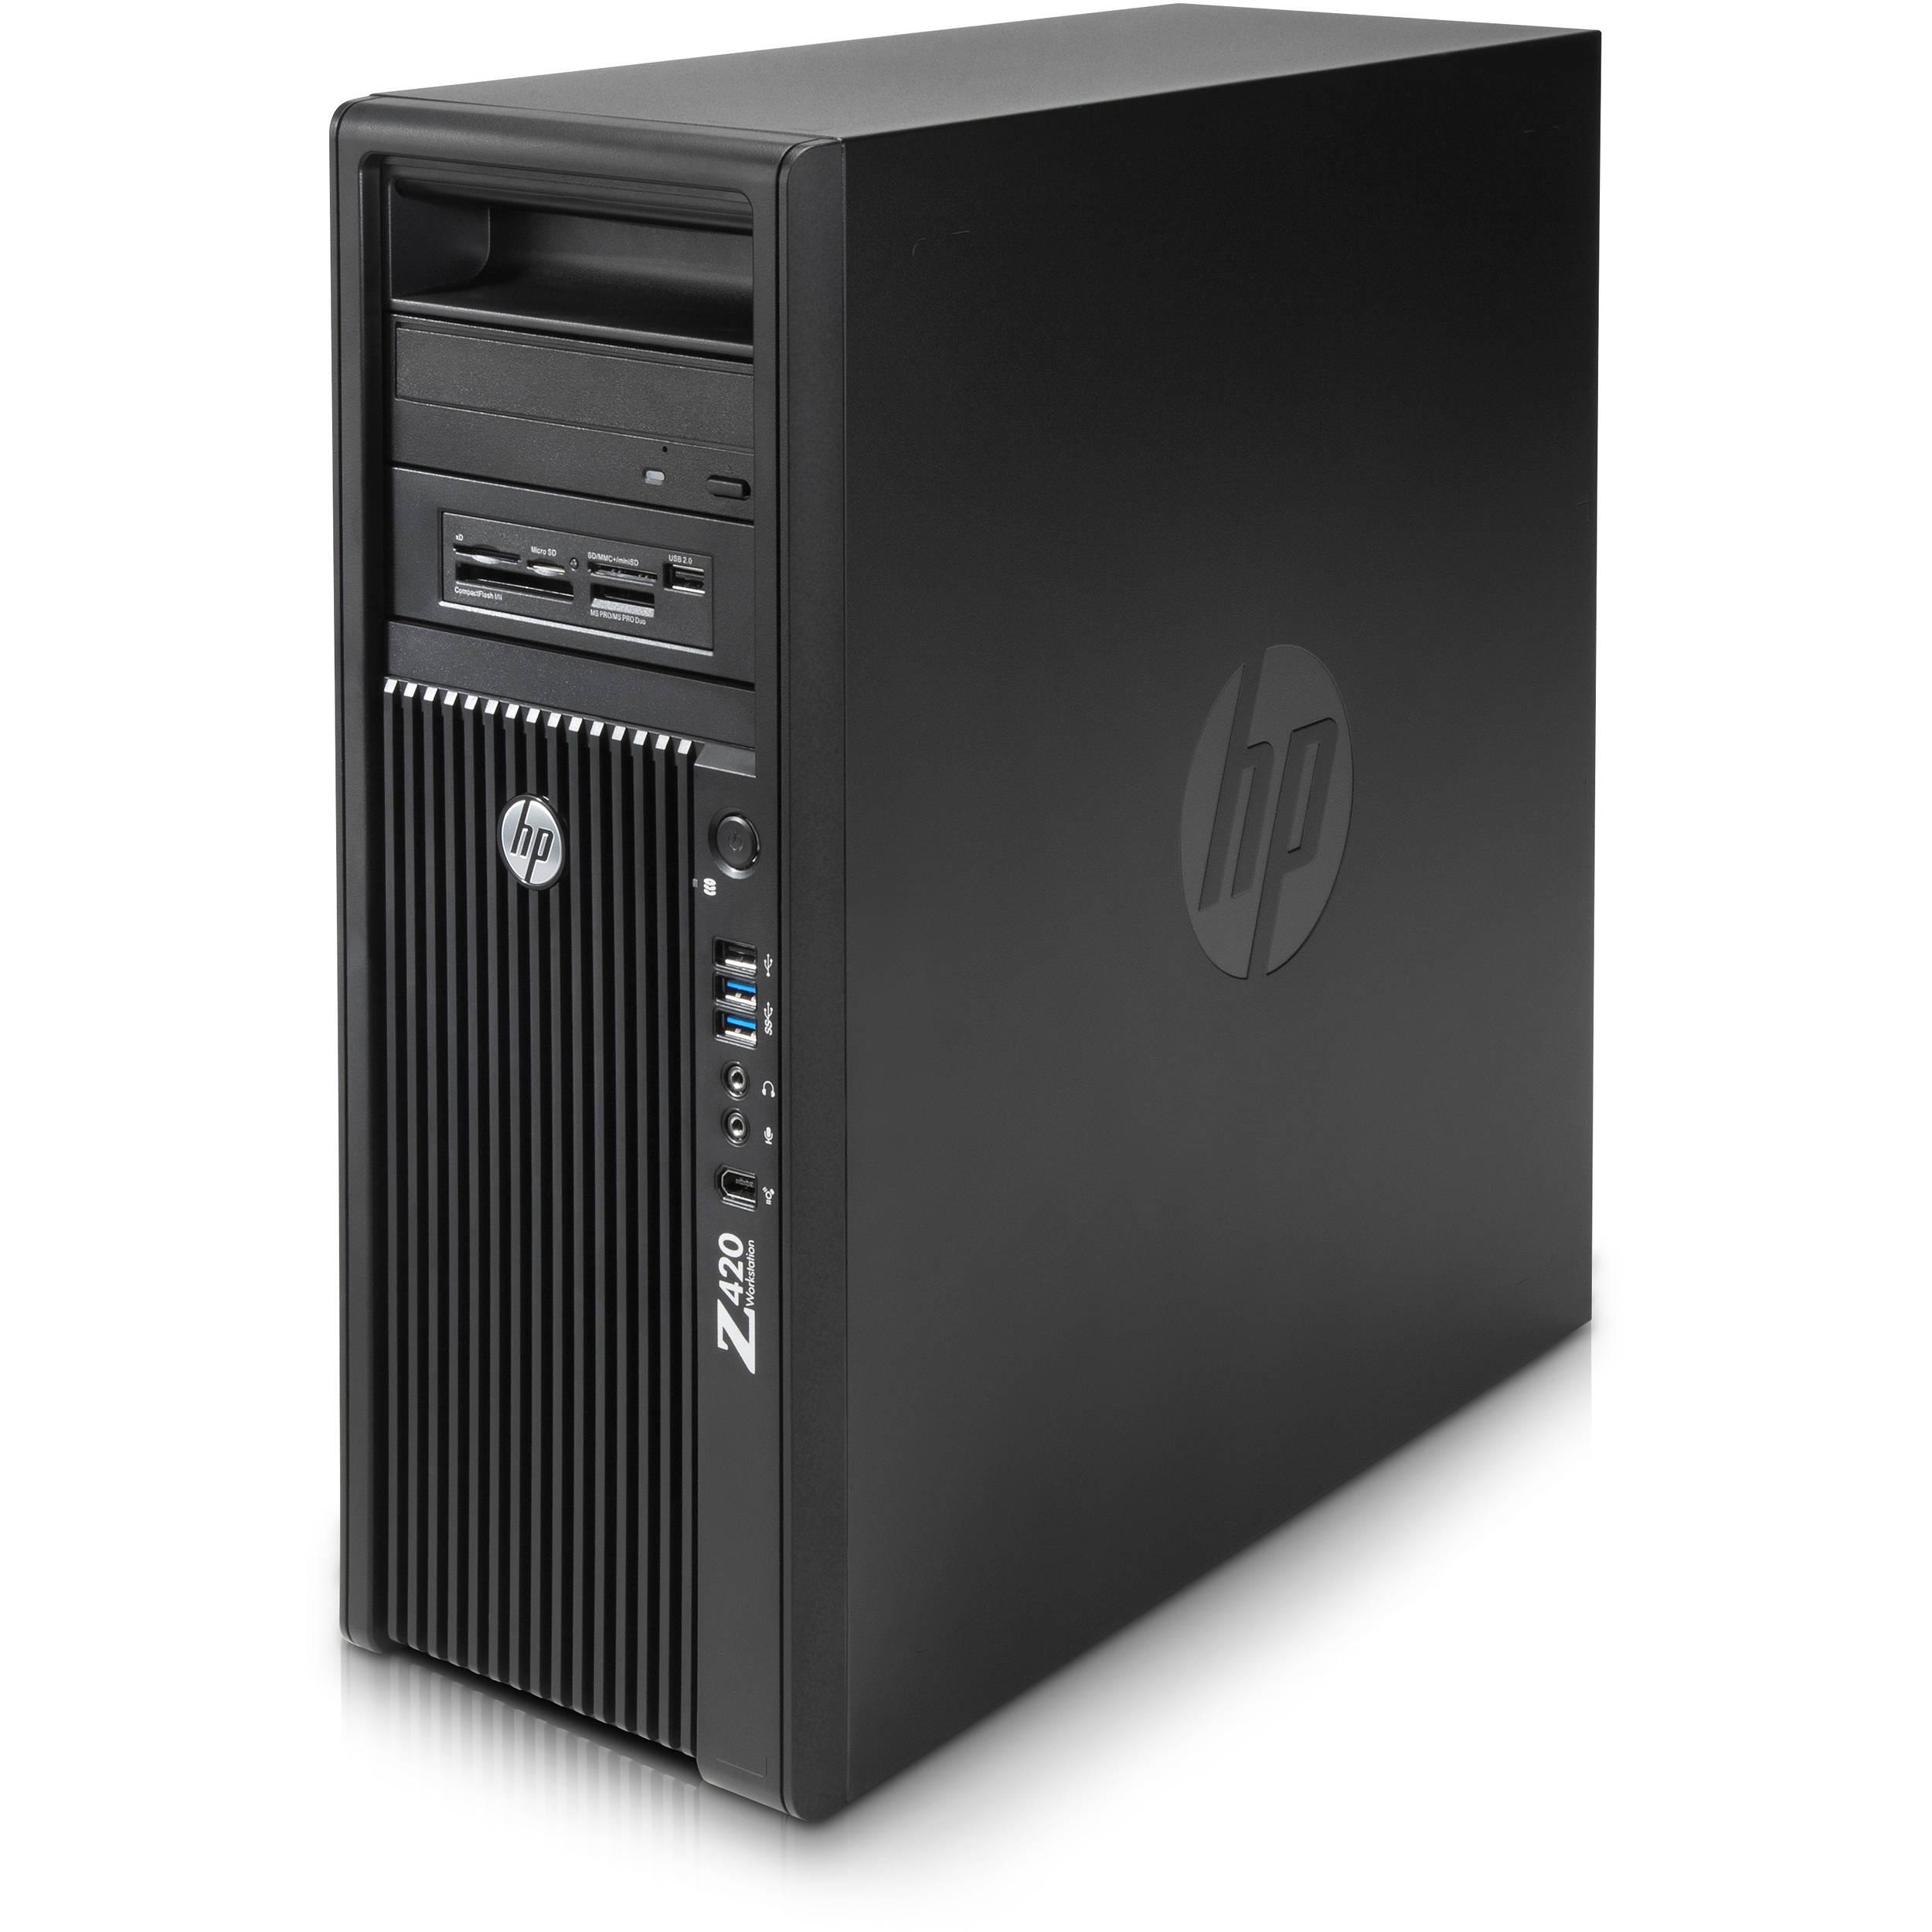 HP Z420 Series B2B93UT Workstation Computer